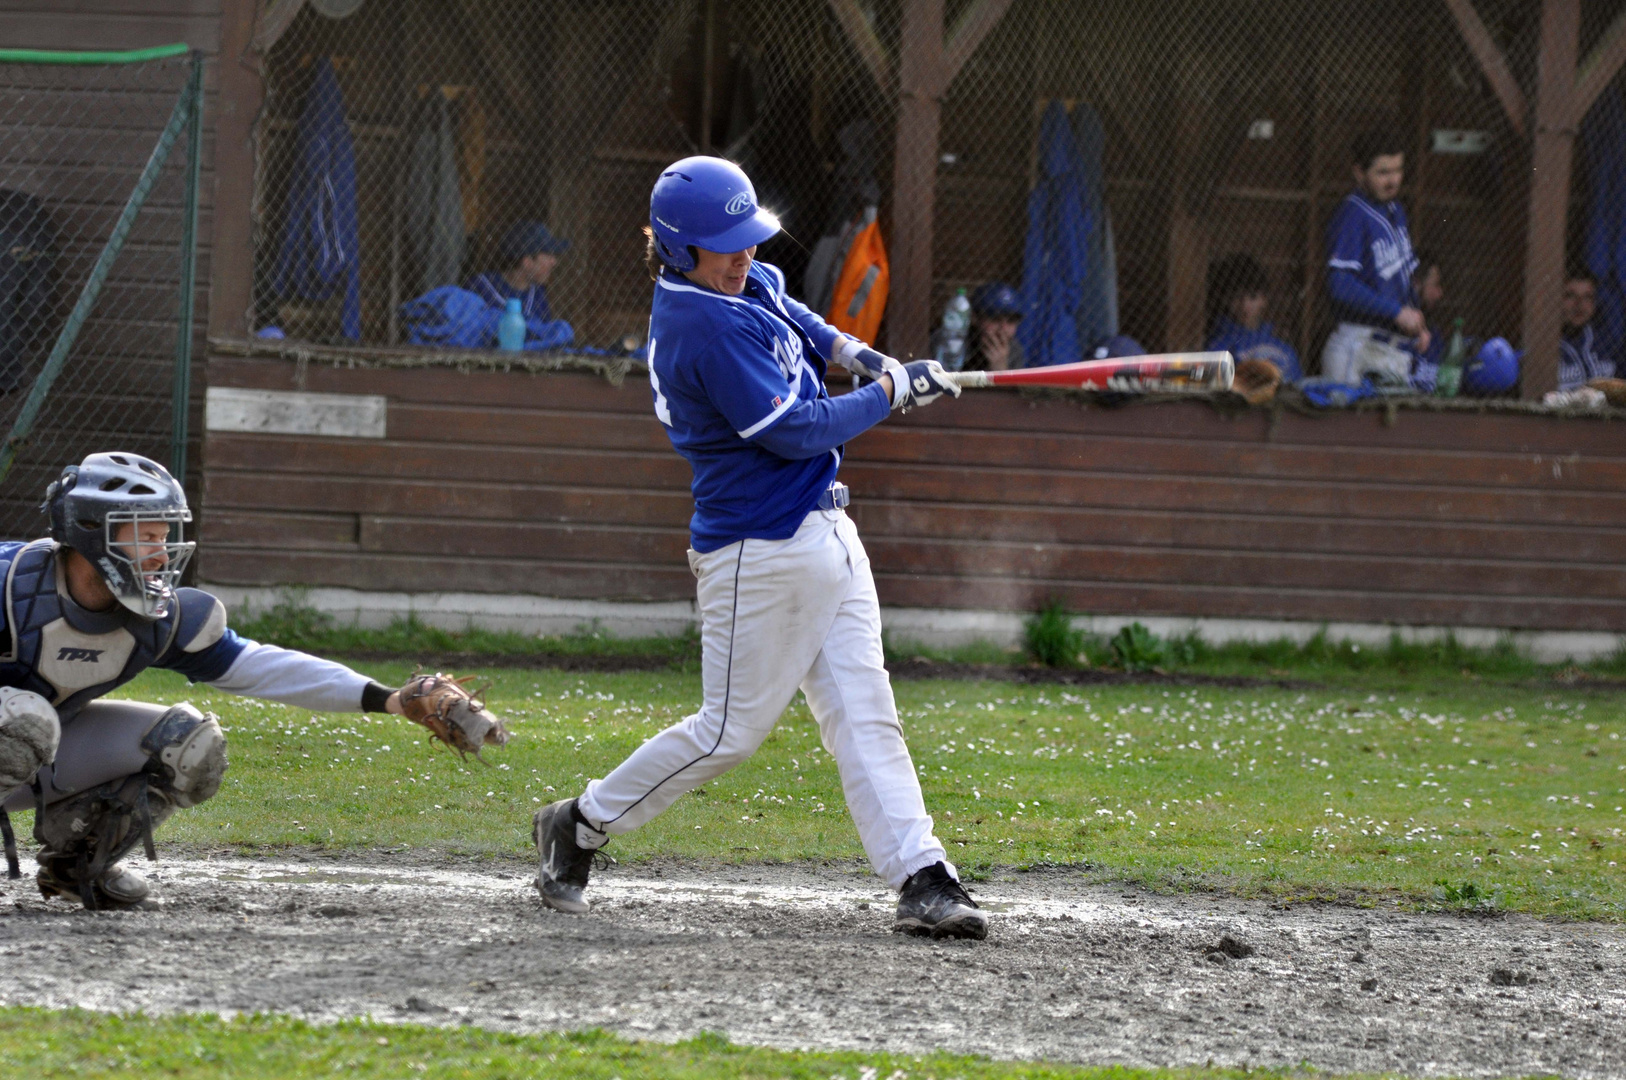 st aubin -médoc vs eysines raiders (baseball )